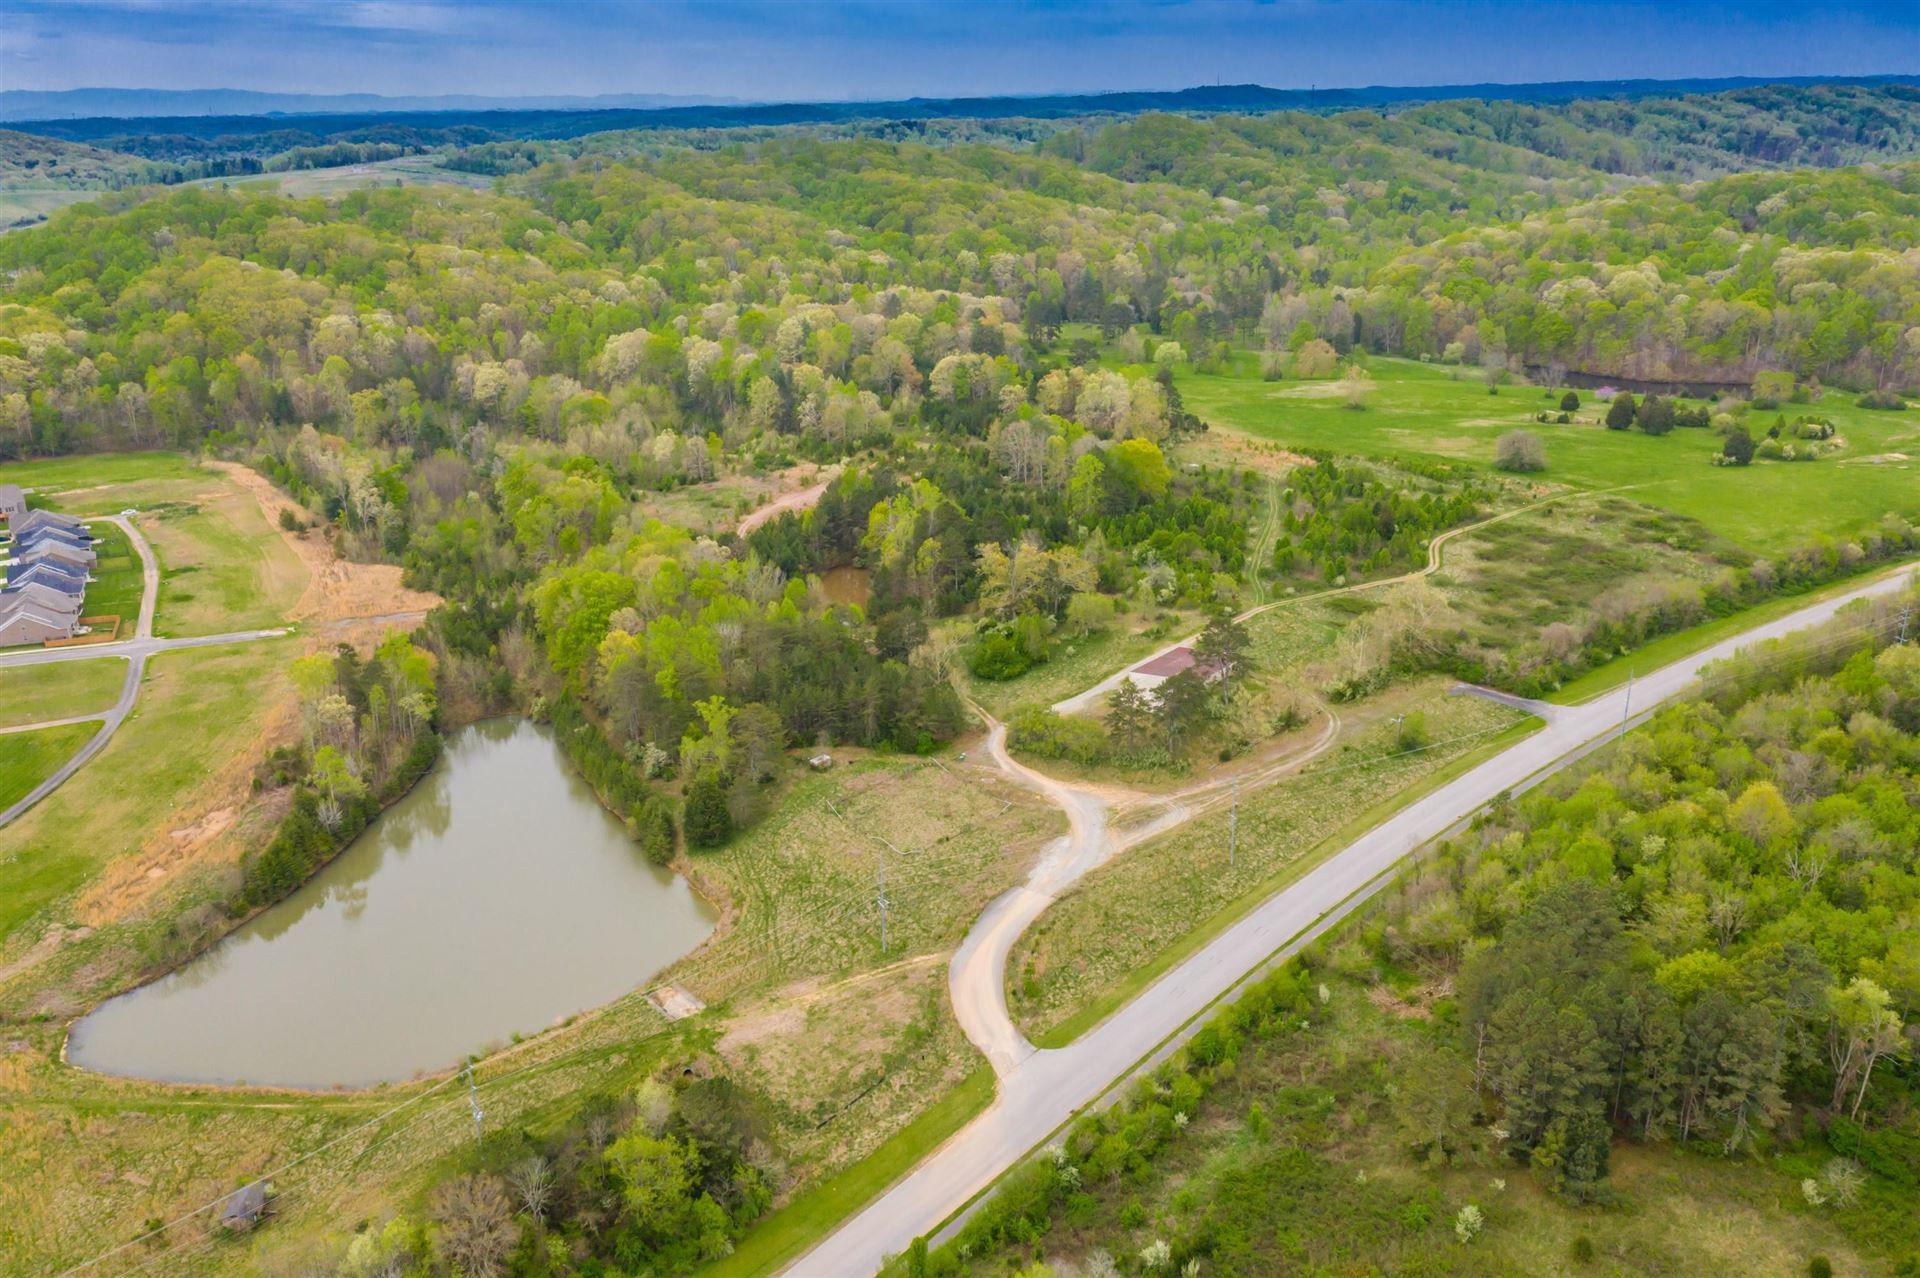 Photo of 795 Tuskegee Drive, Oak Ridge, TN 37830 (MLS # 1149099)